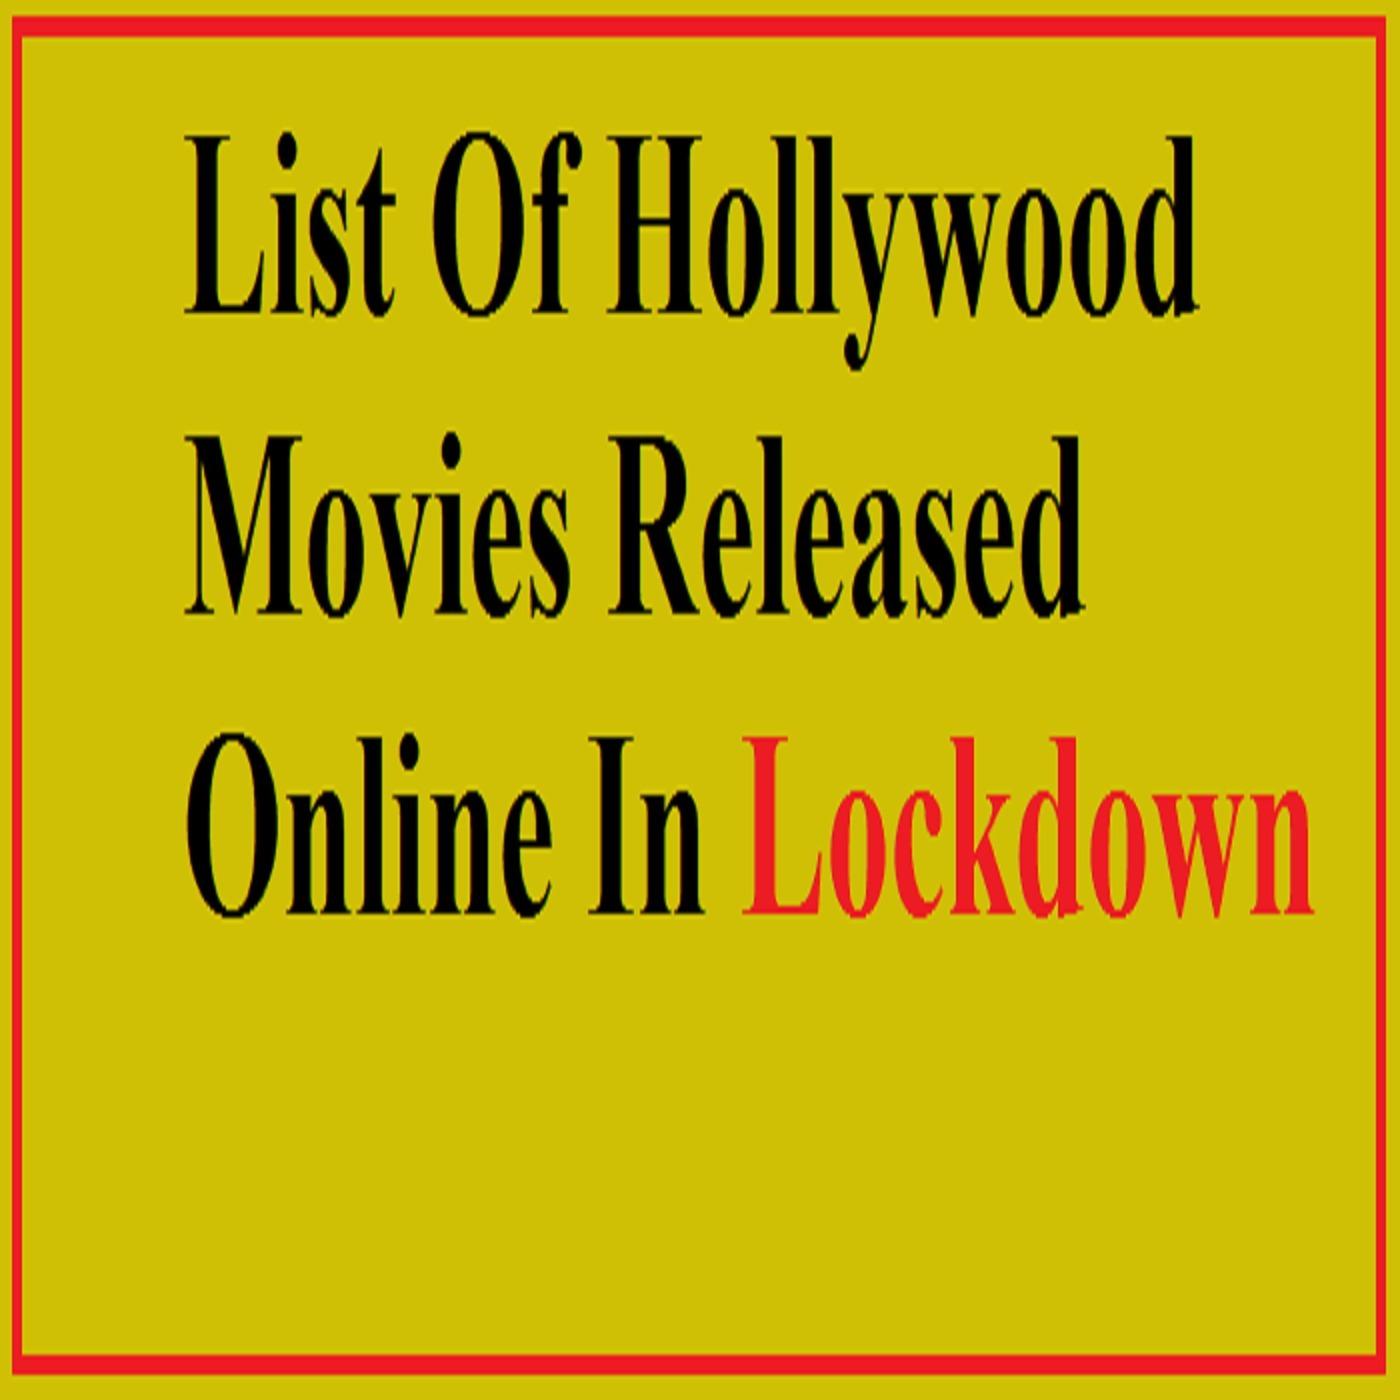 Watch Hollywood Movies Released Online In Lockdown